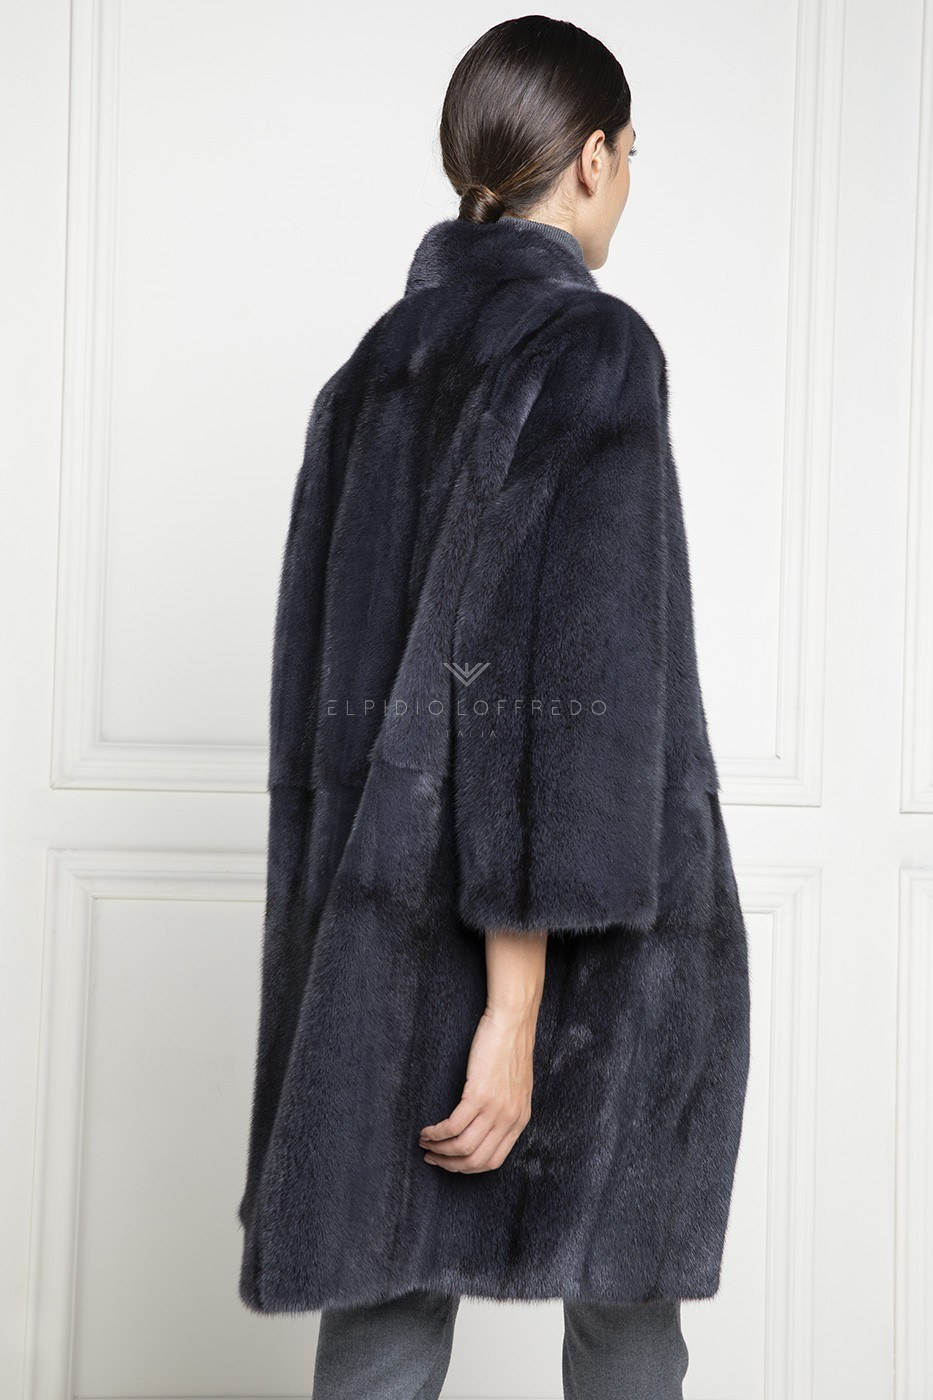 Blue Cross Mink Coat - Length 95 cm